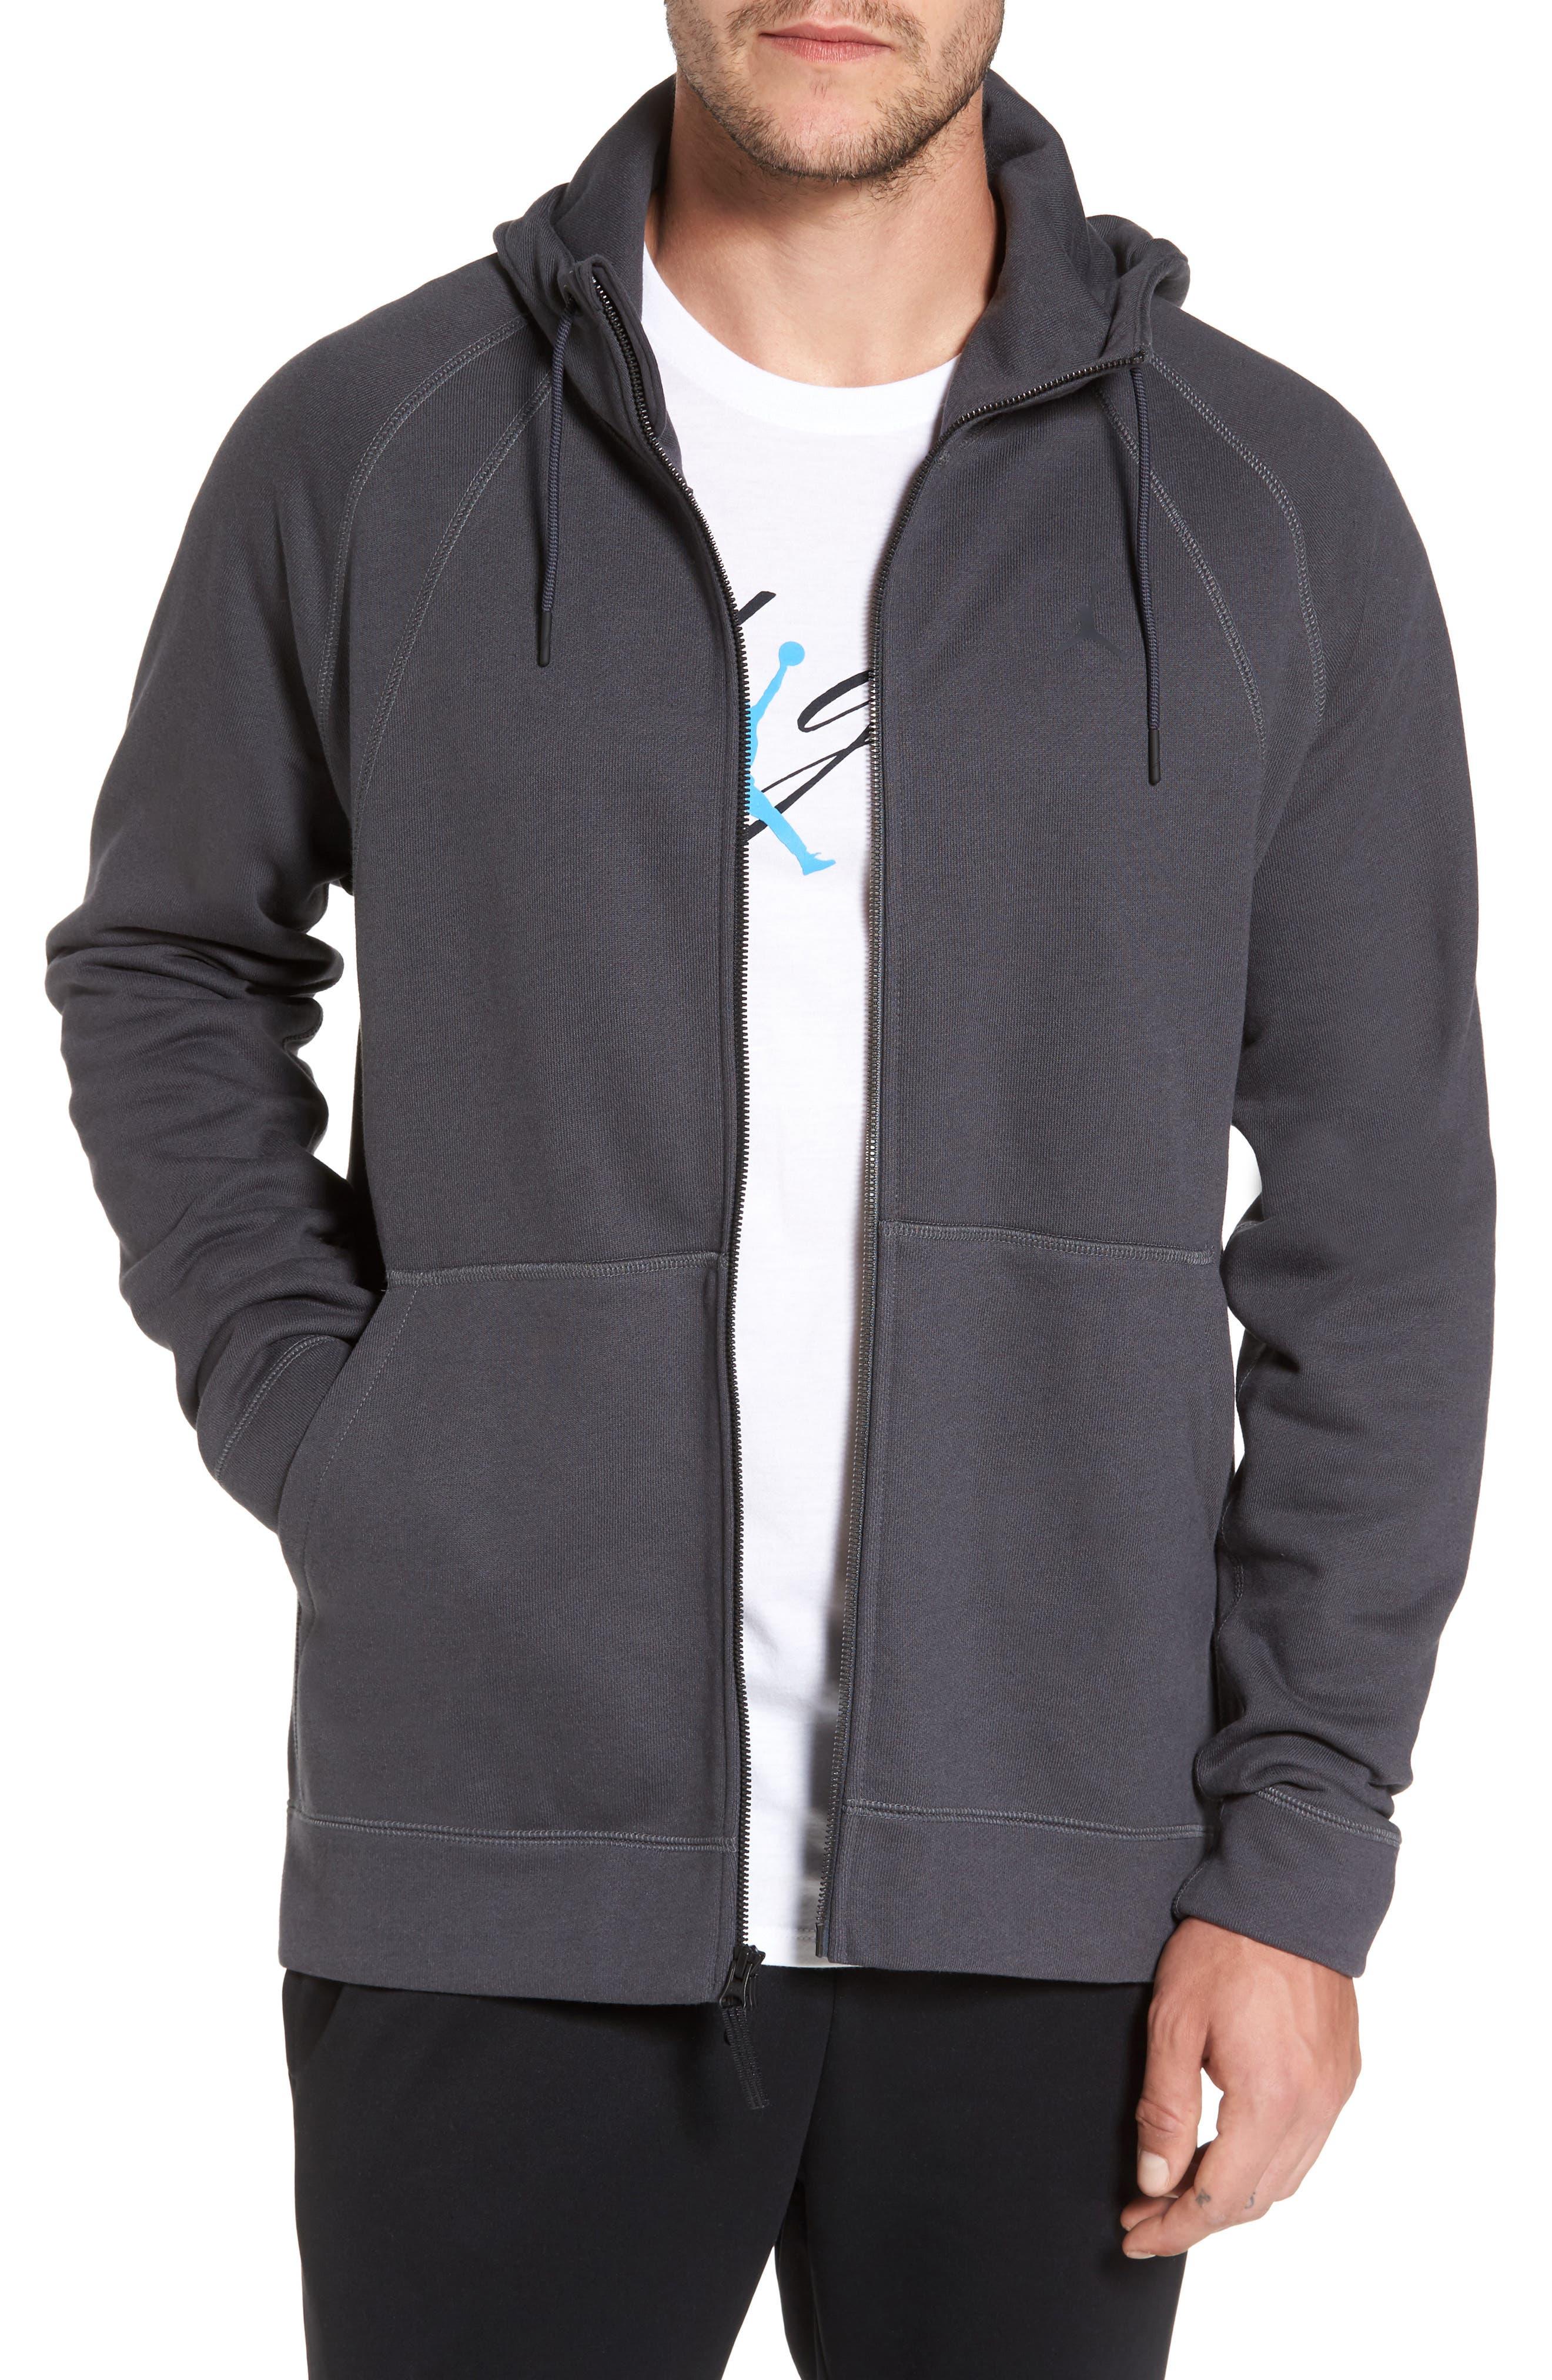 Main Image - Nike Jordan Sportswear Wings Full Zip Jacket